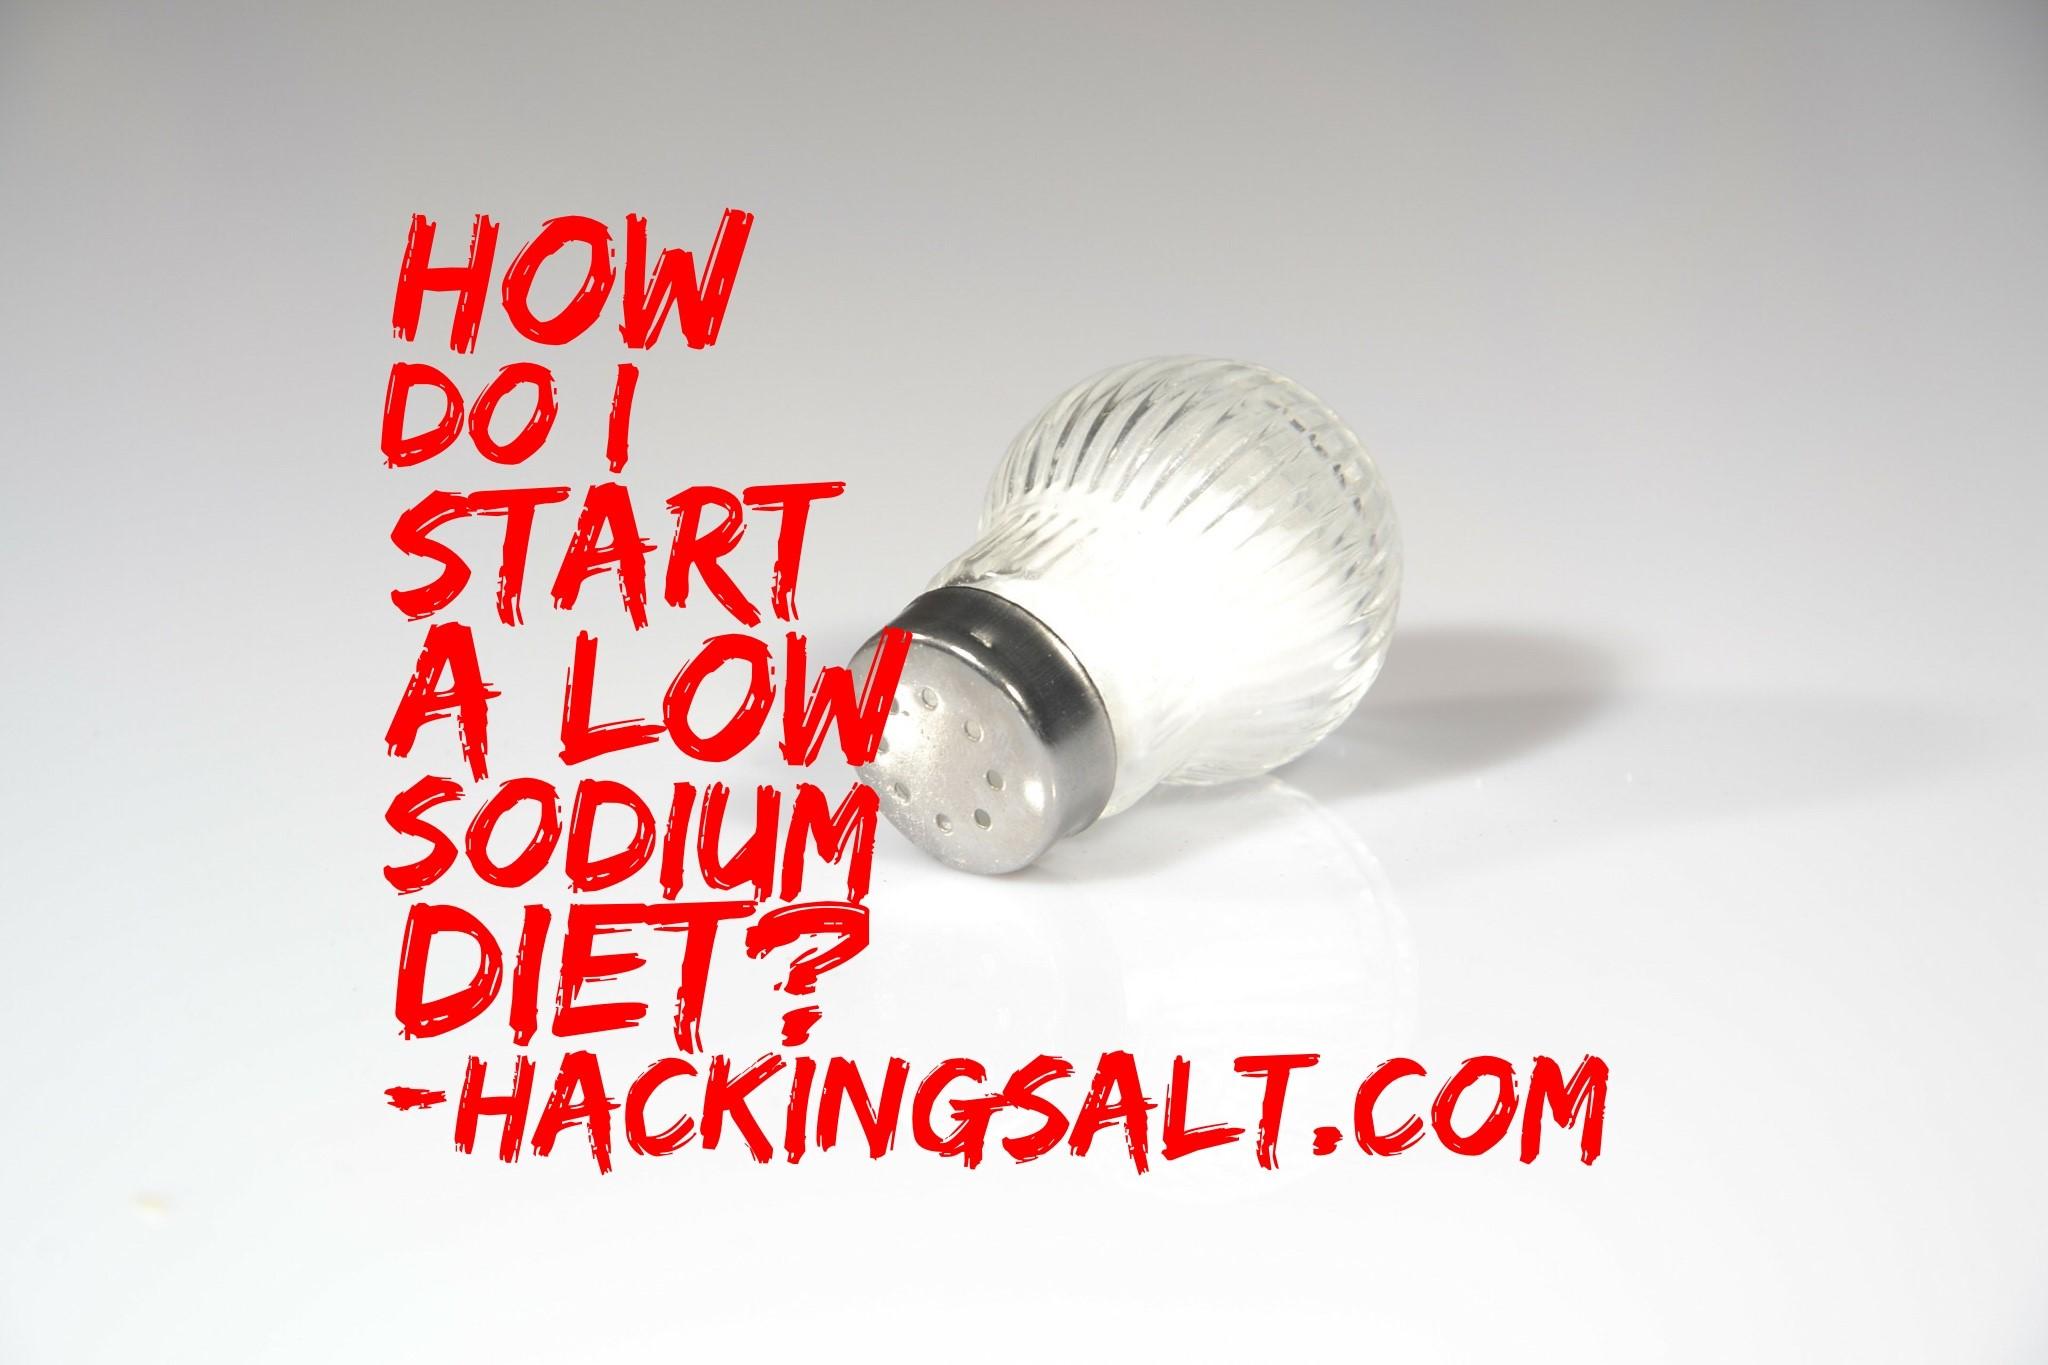 how do i start a low sodium diet - hacking salt, Skeleton